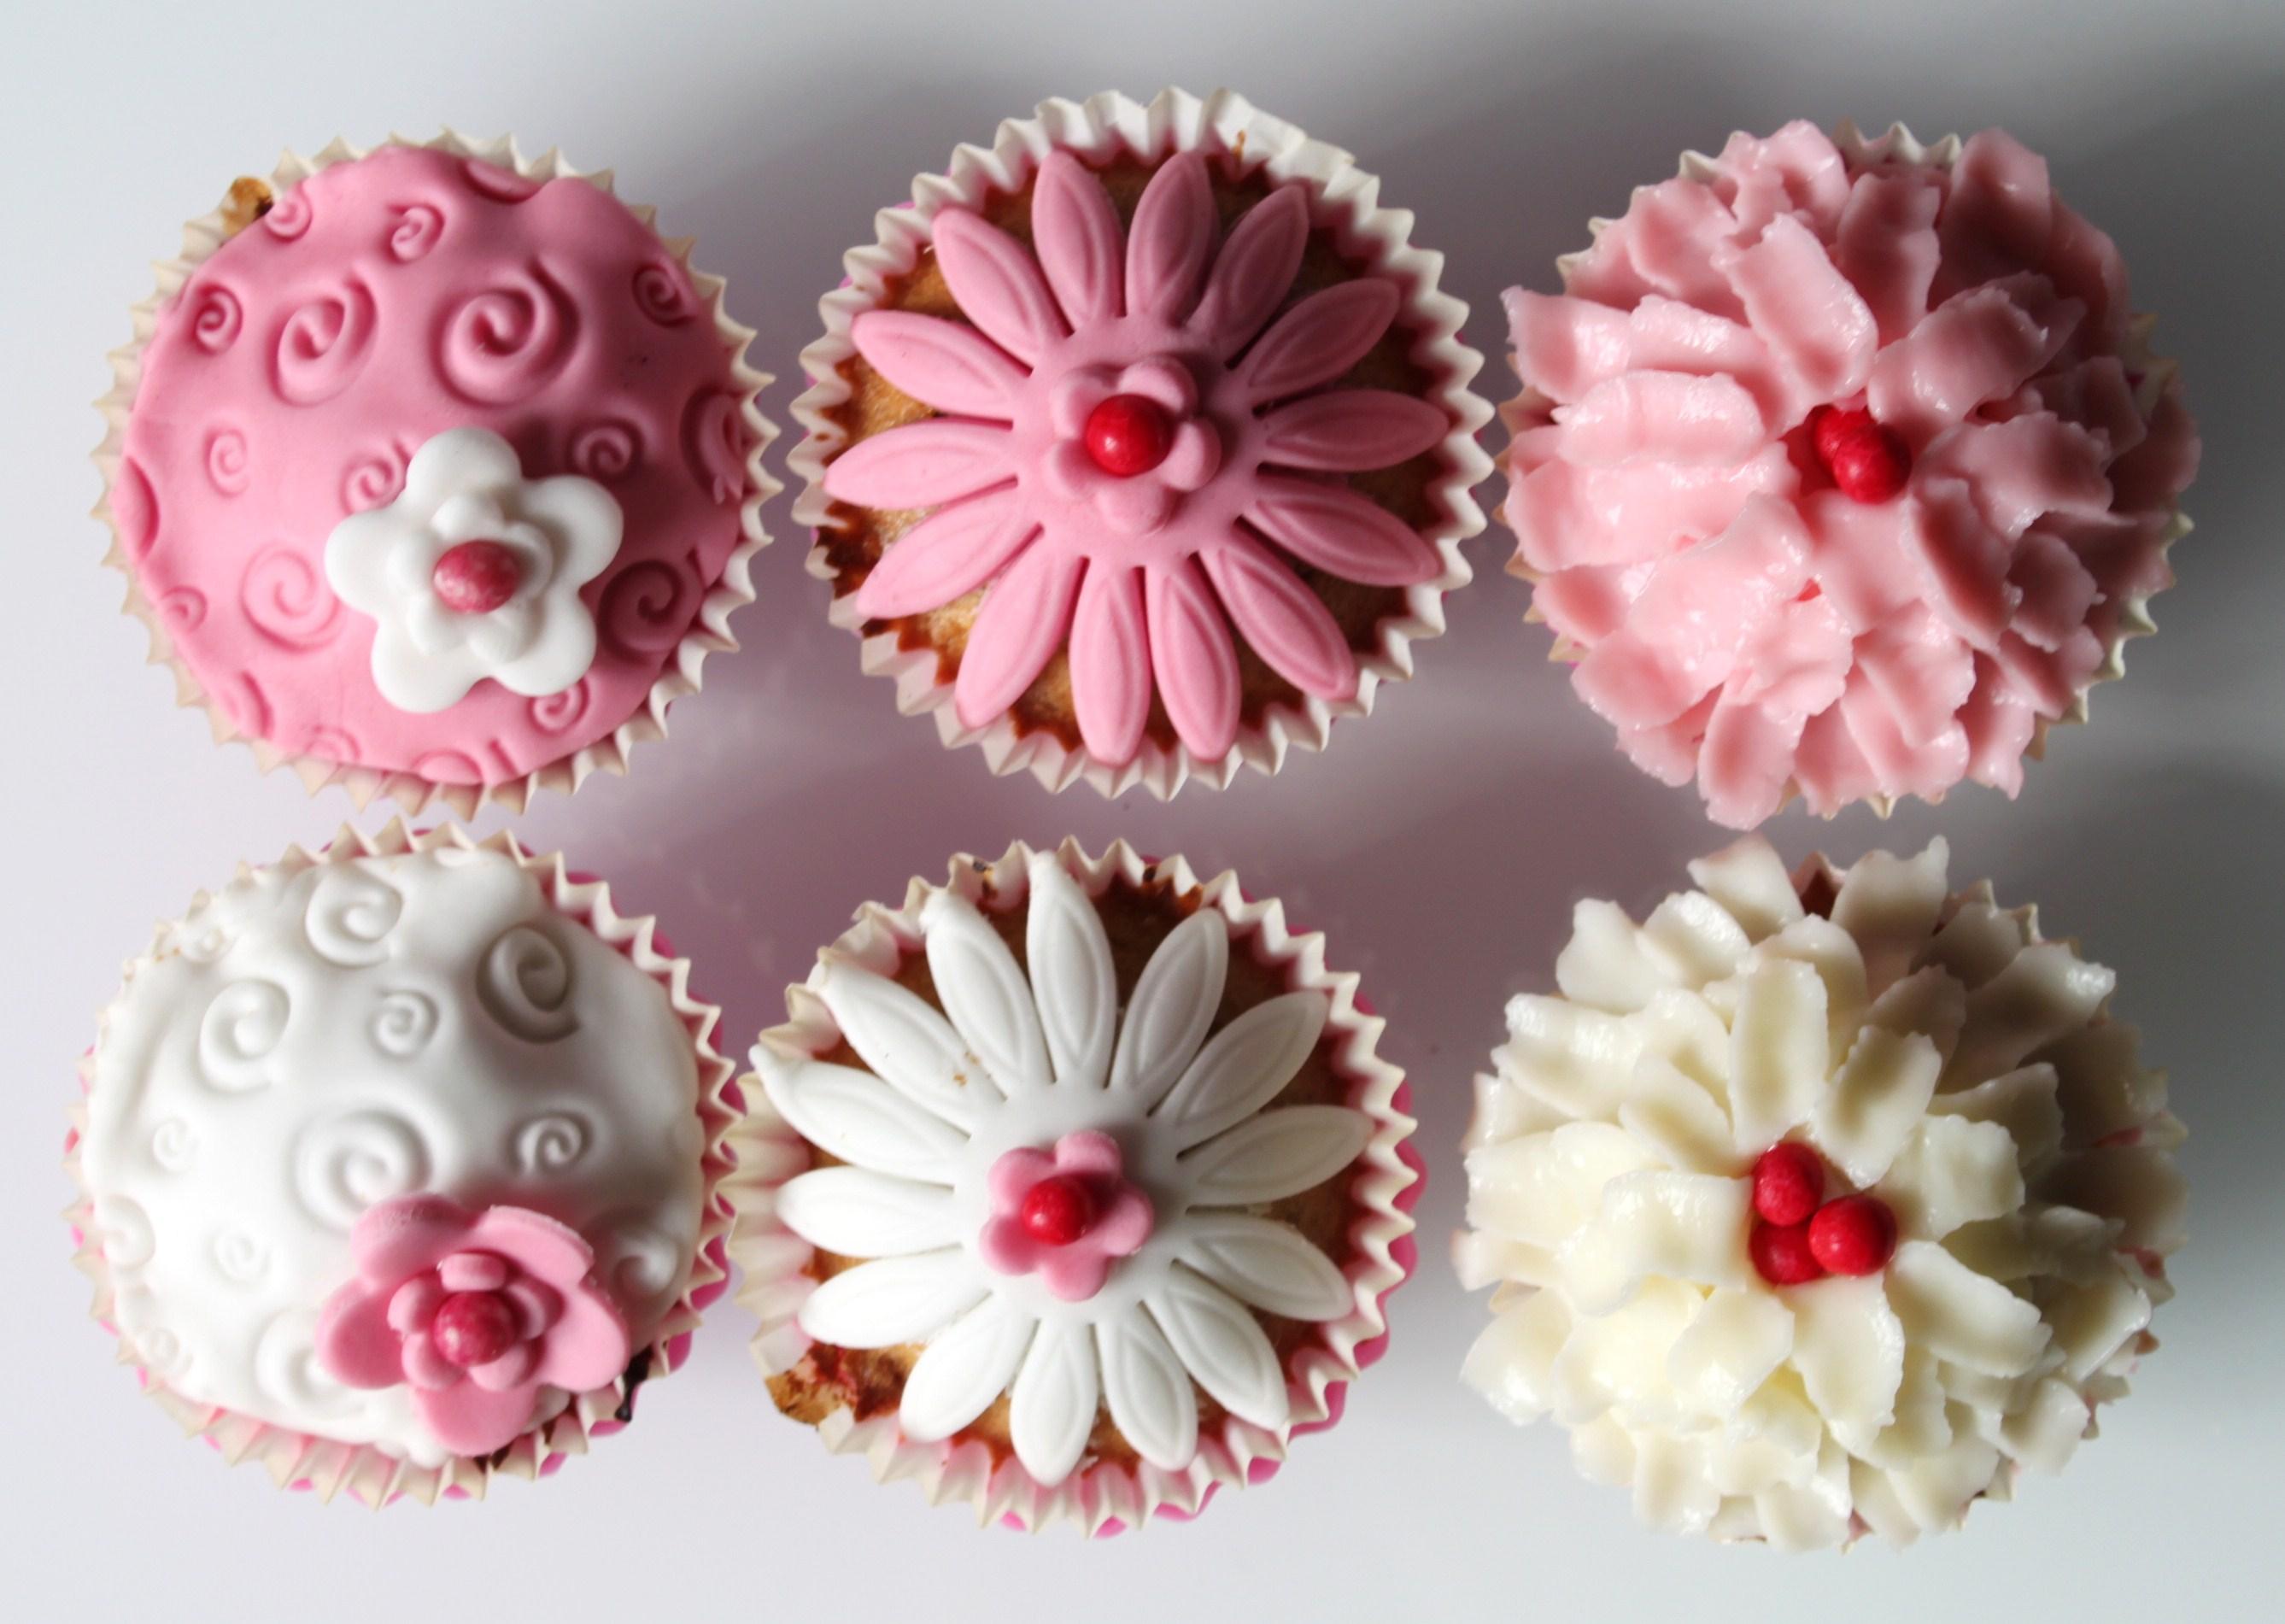 cupcakes design rose la fabricamania With commentaire faire la couleur bleu 15 cupcakes design rose la fabricamania